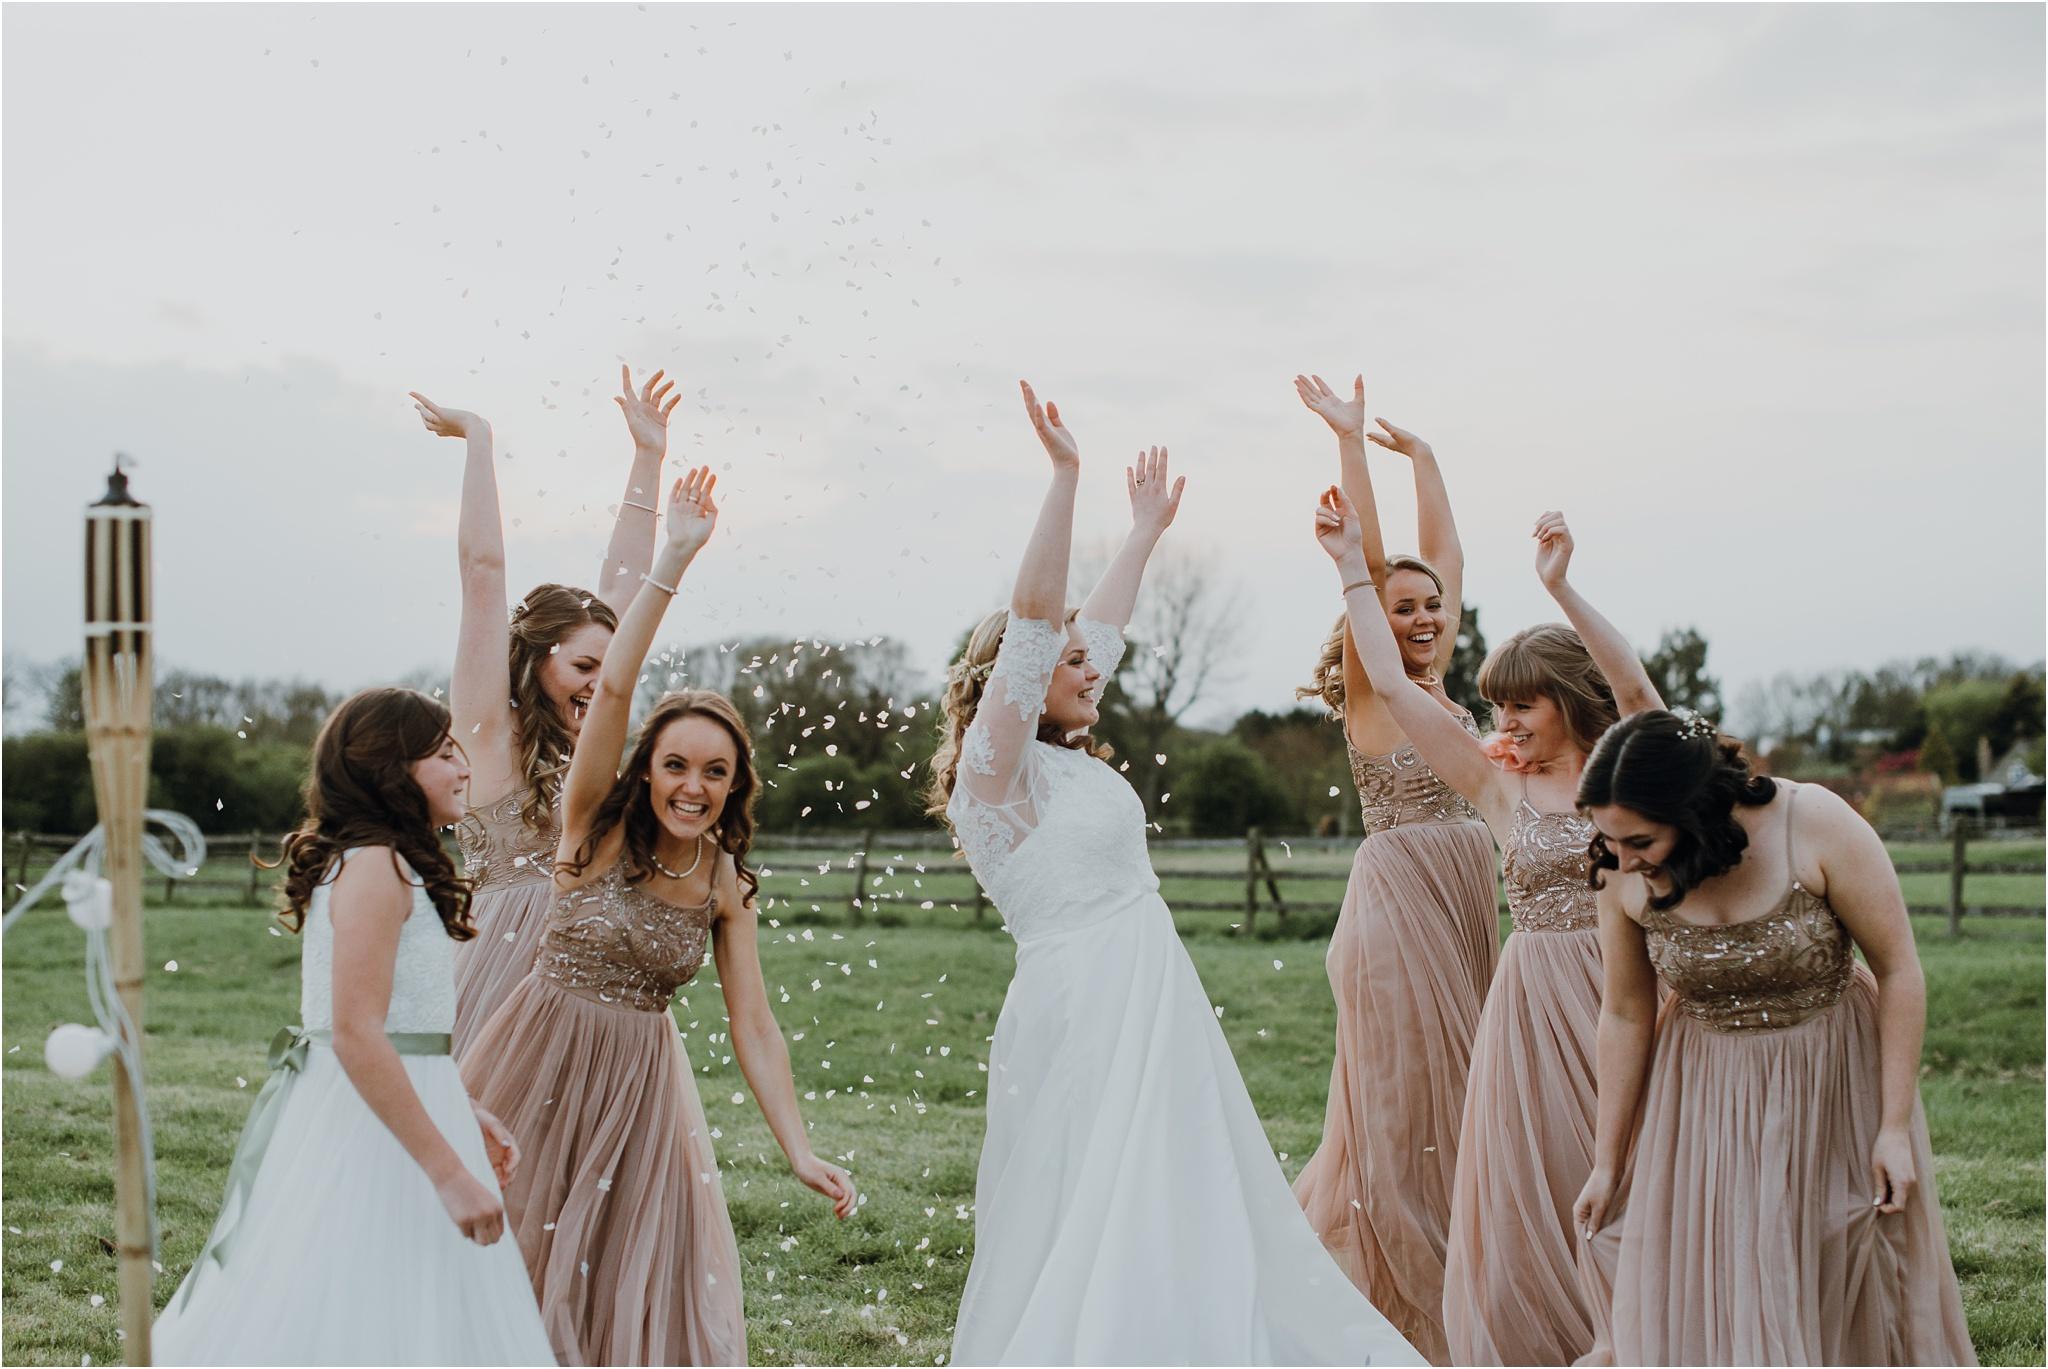 Outdoor-country-wedding-Edinburgh-photographer__0135.jpg